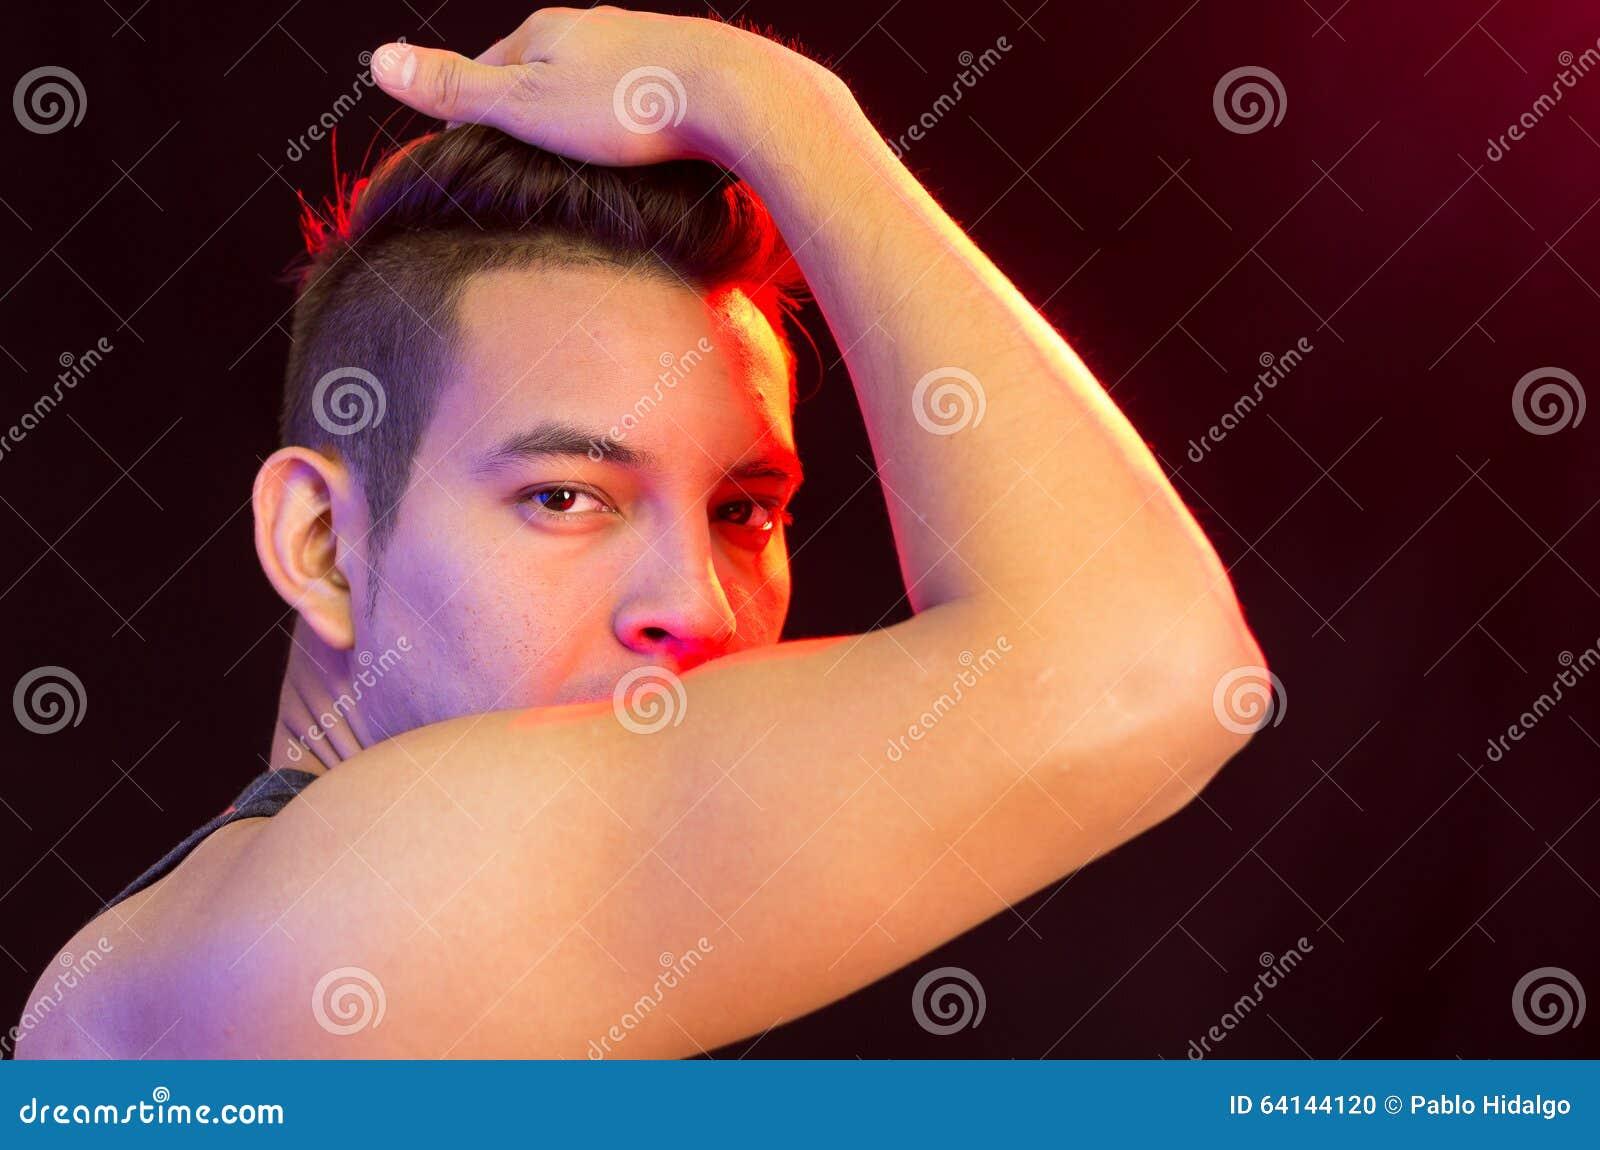 Spaans mannetje die rood zwart gestreept hemd dragen